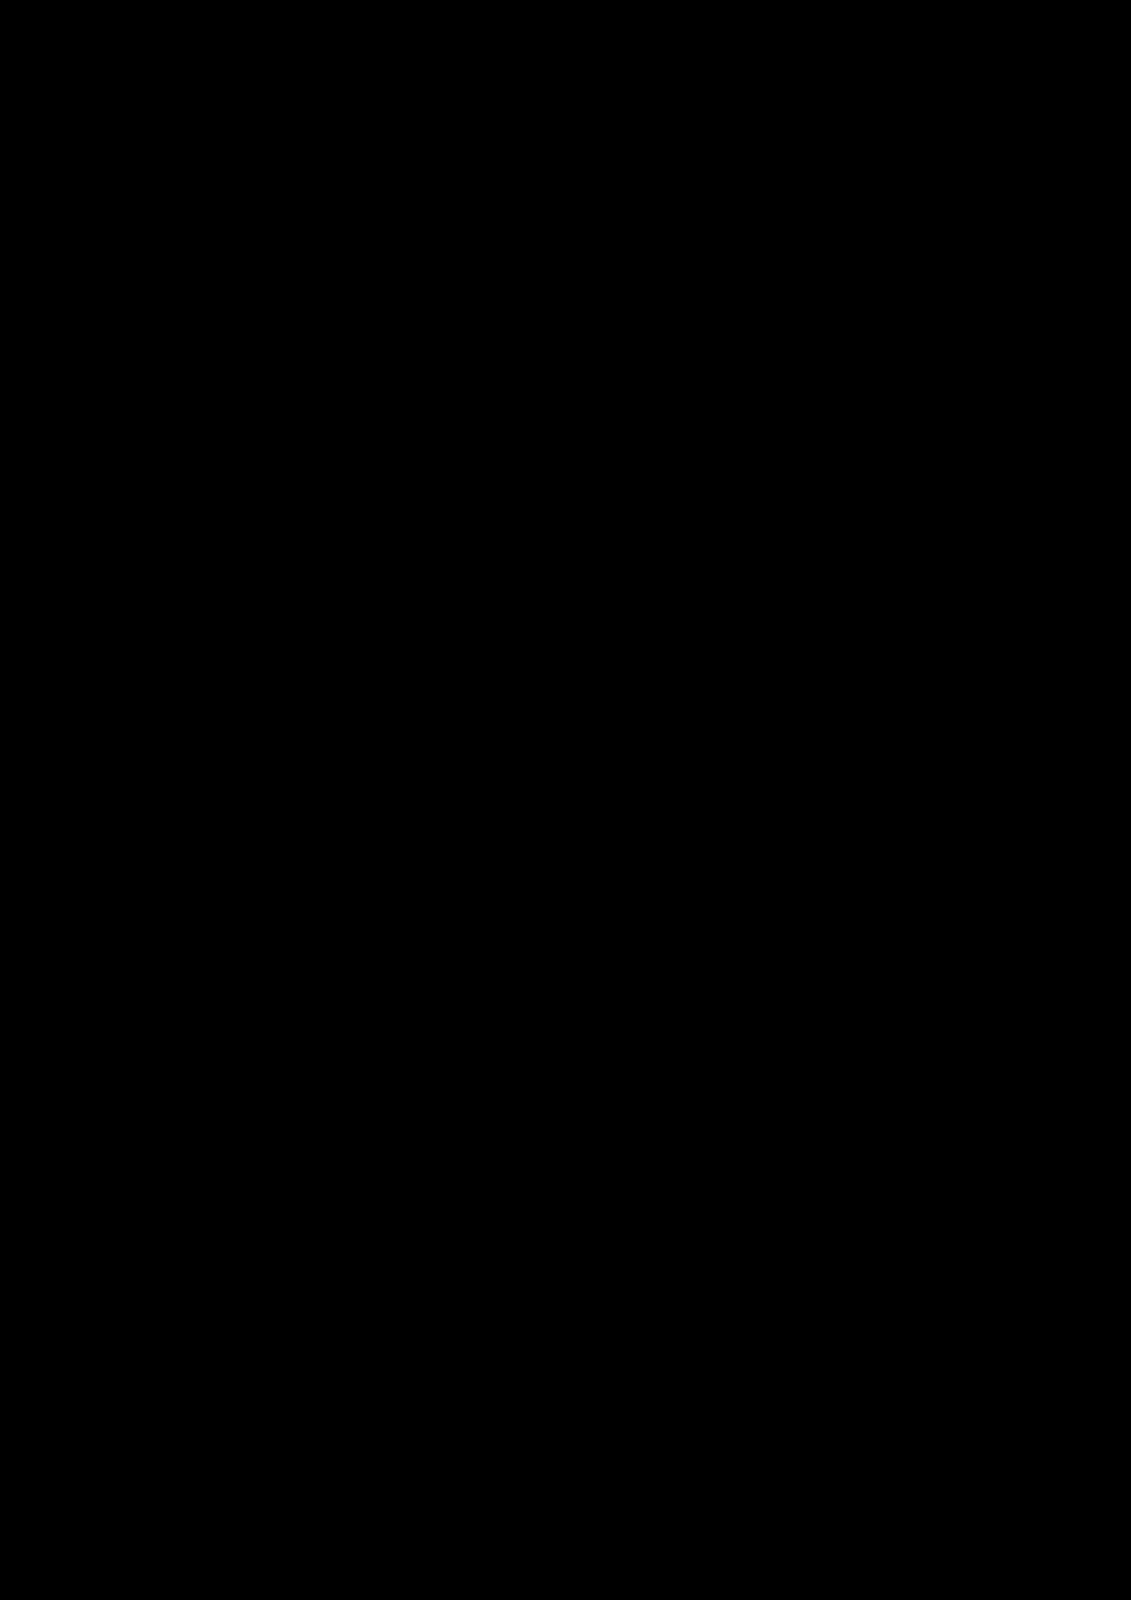 Clarinet pop sheet music for popular songs